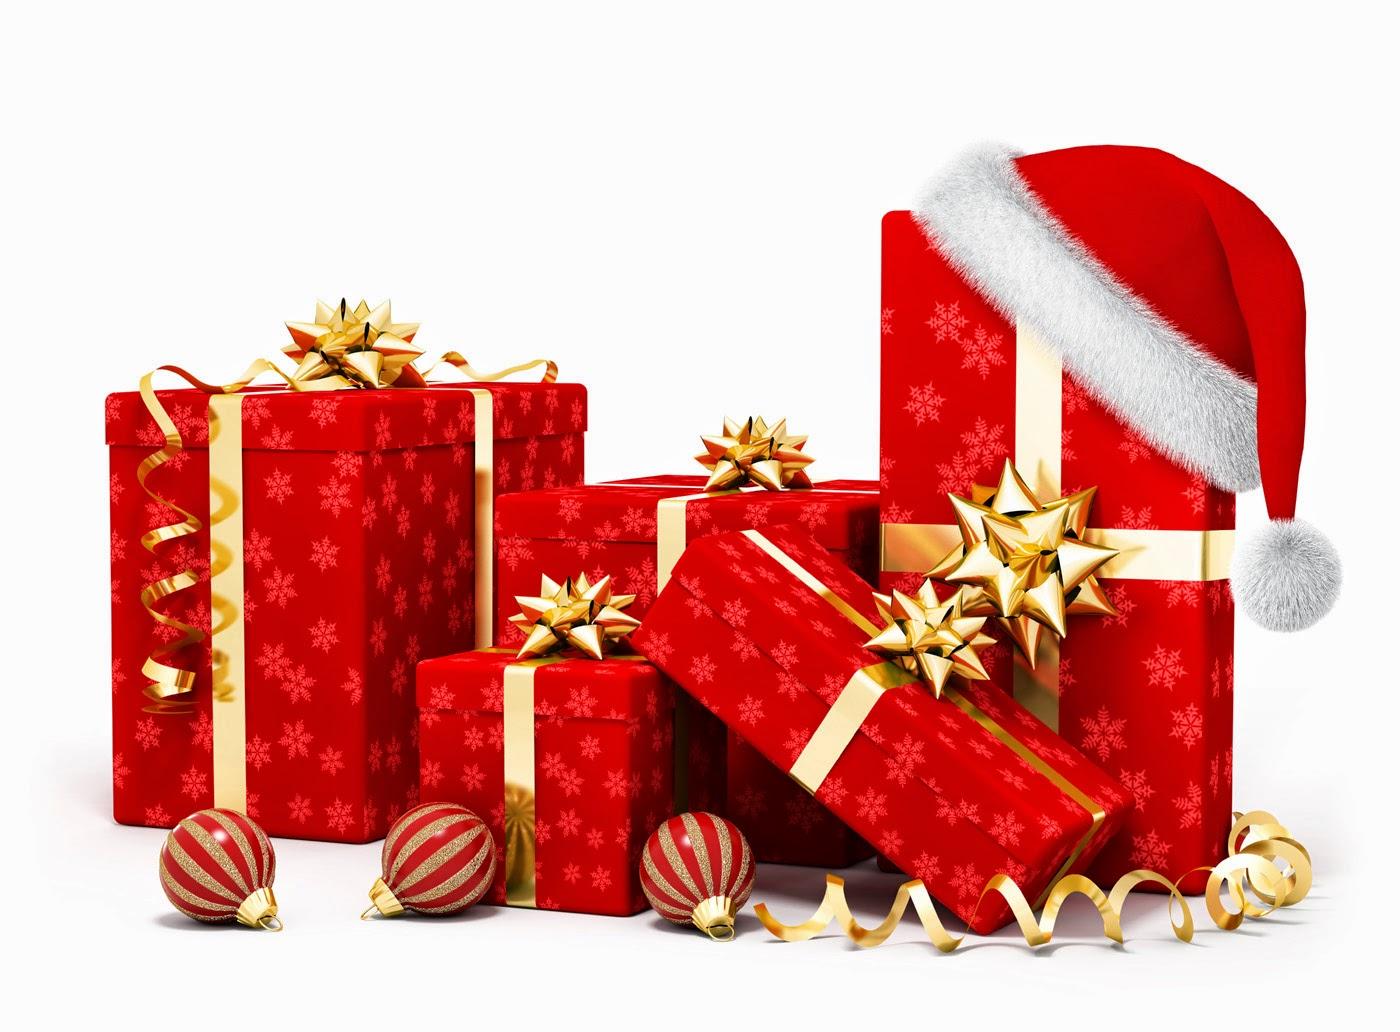 Mini Canvas Christmas Gift Tags – So Cute & Easy To Make ... |Pretty Christmas Presents